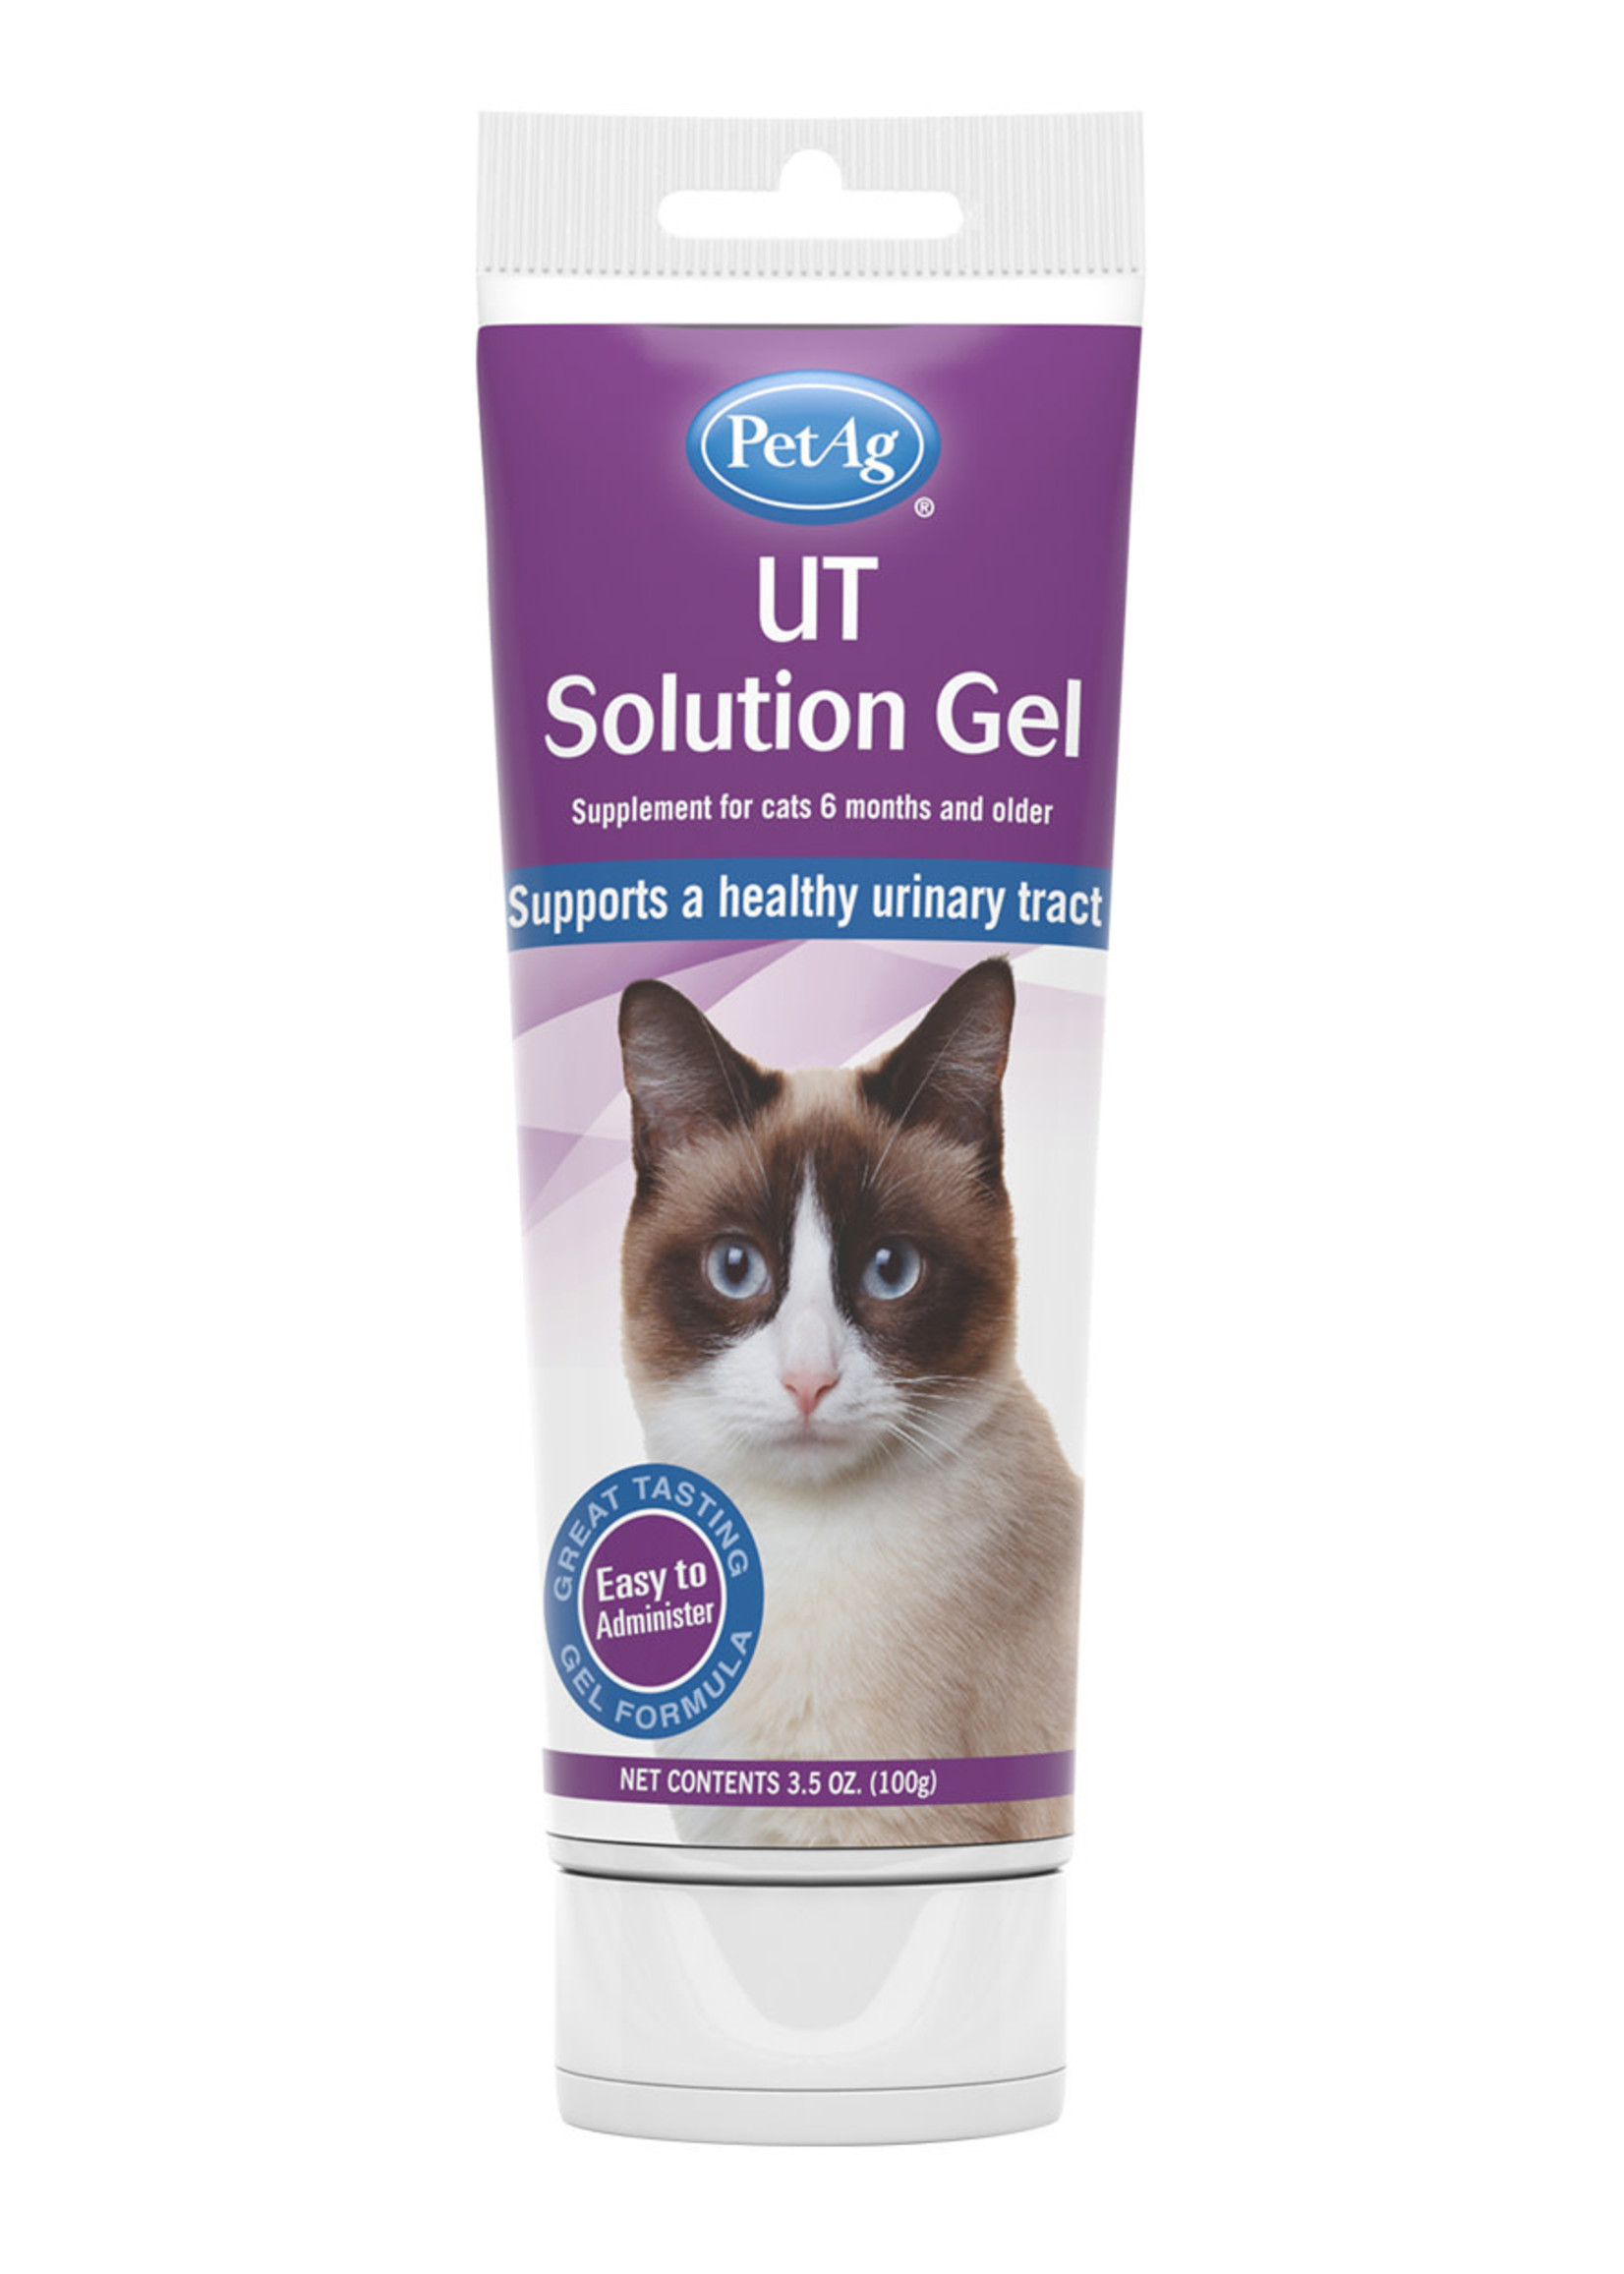 PetAg® PETAG UT SOLUTION GEL CAT